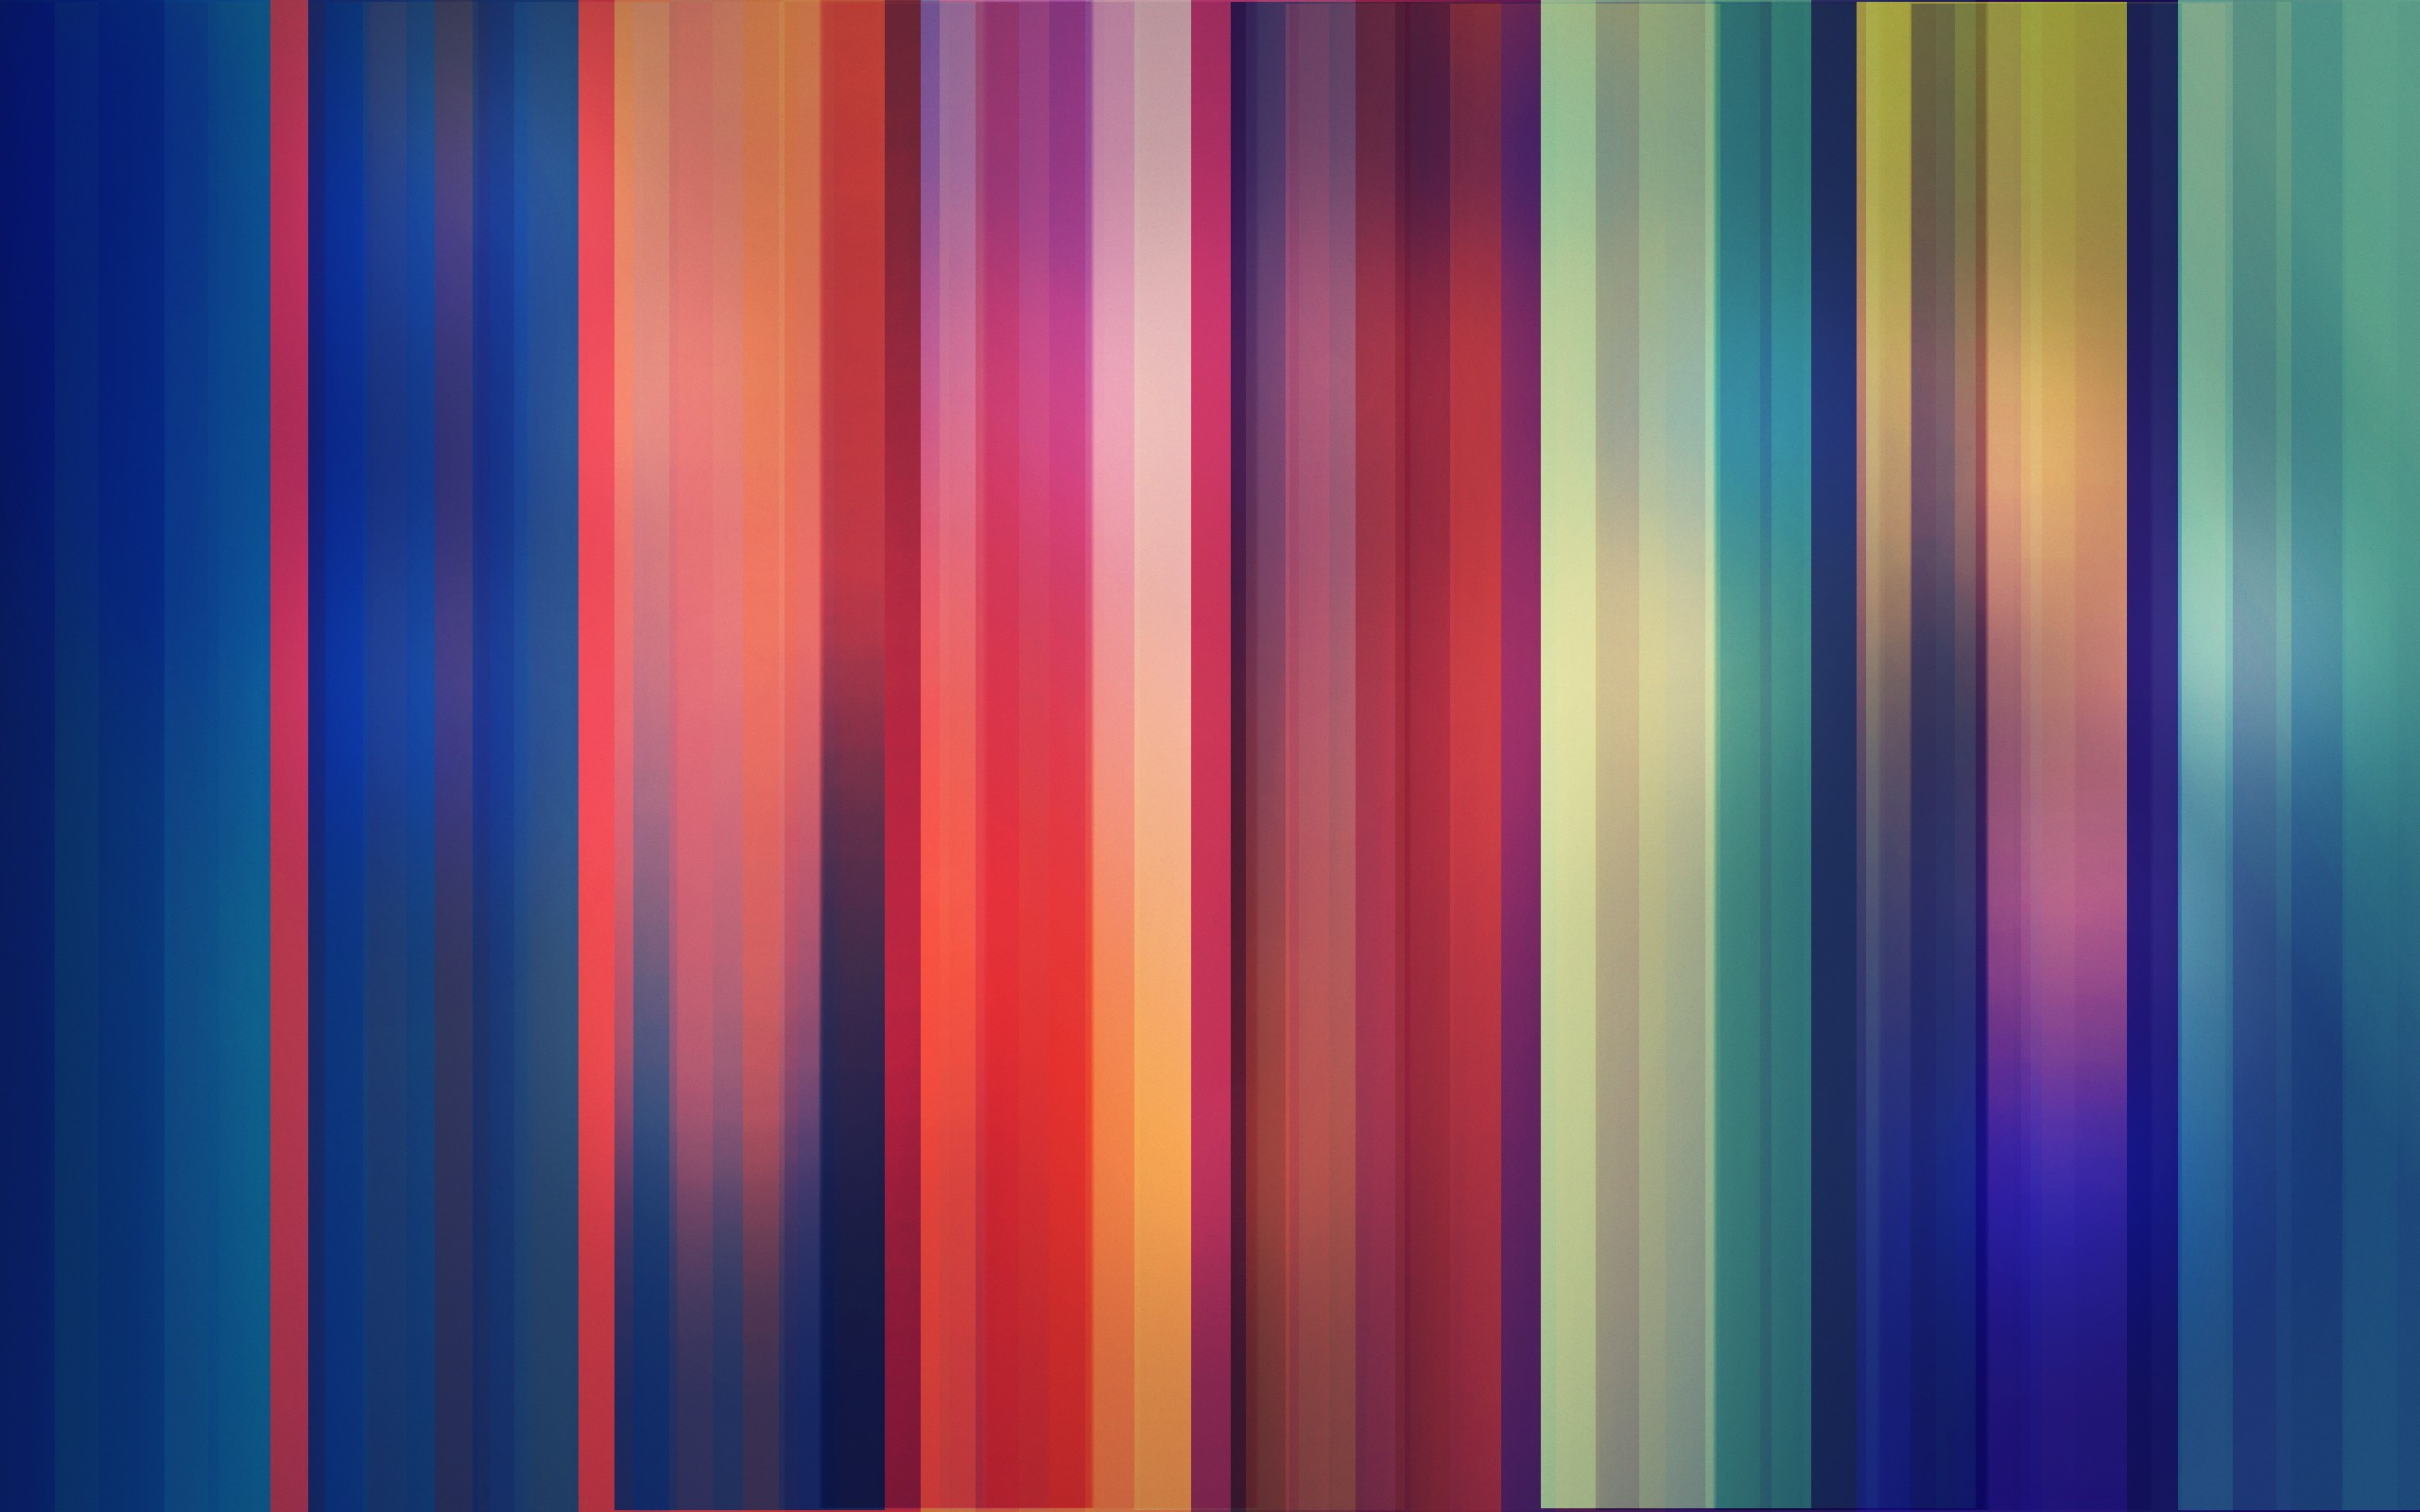 Stripe Wallpapers